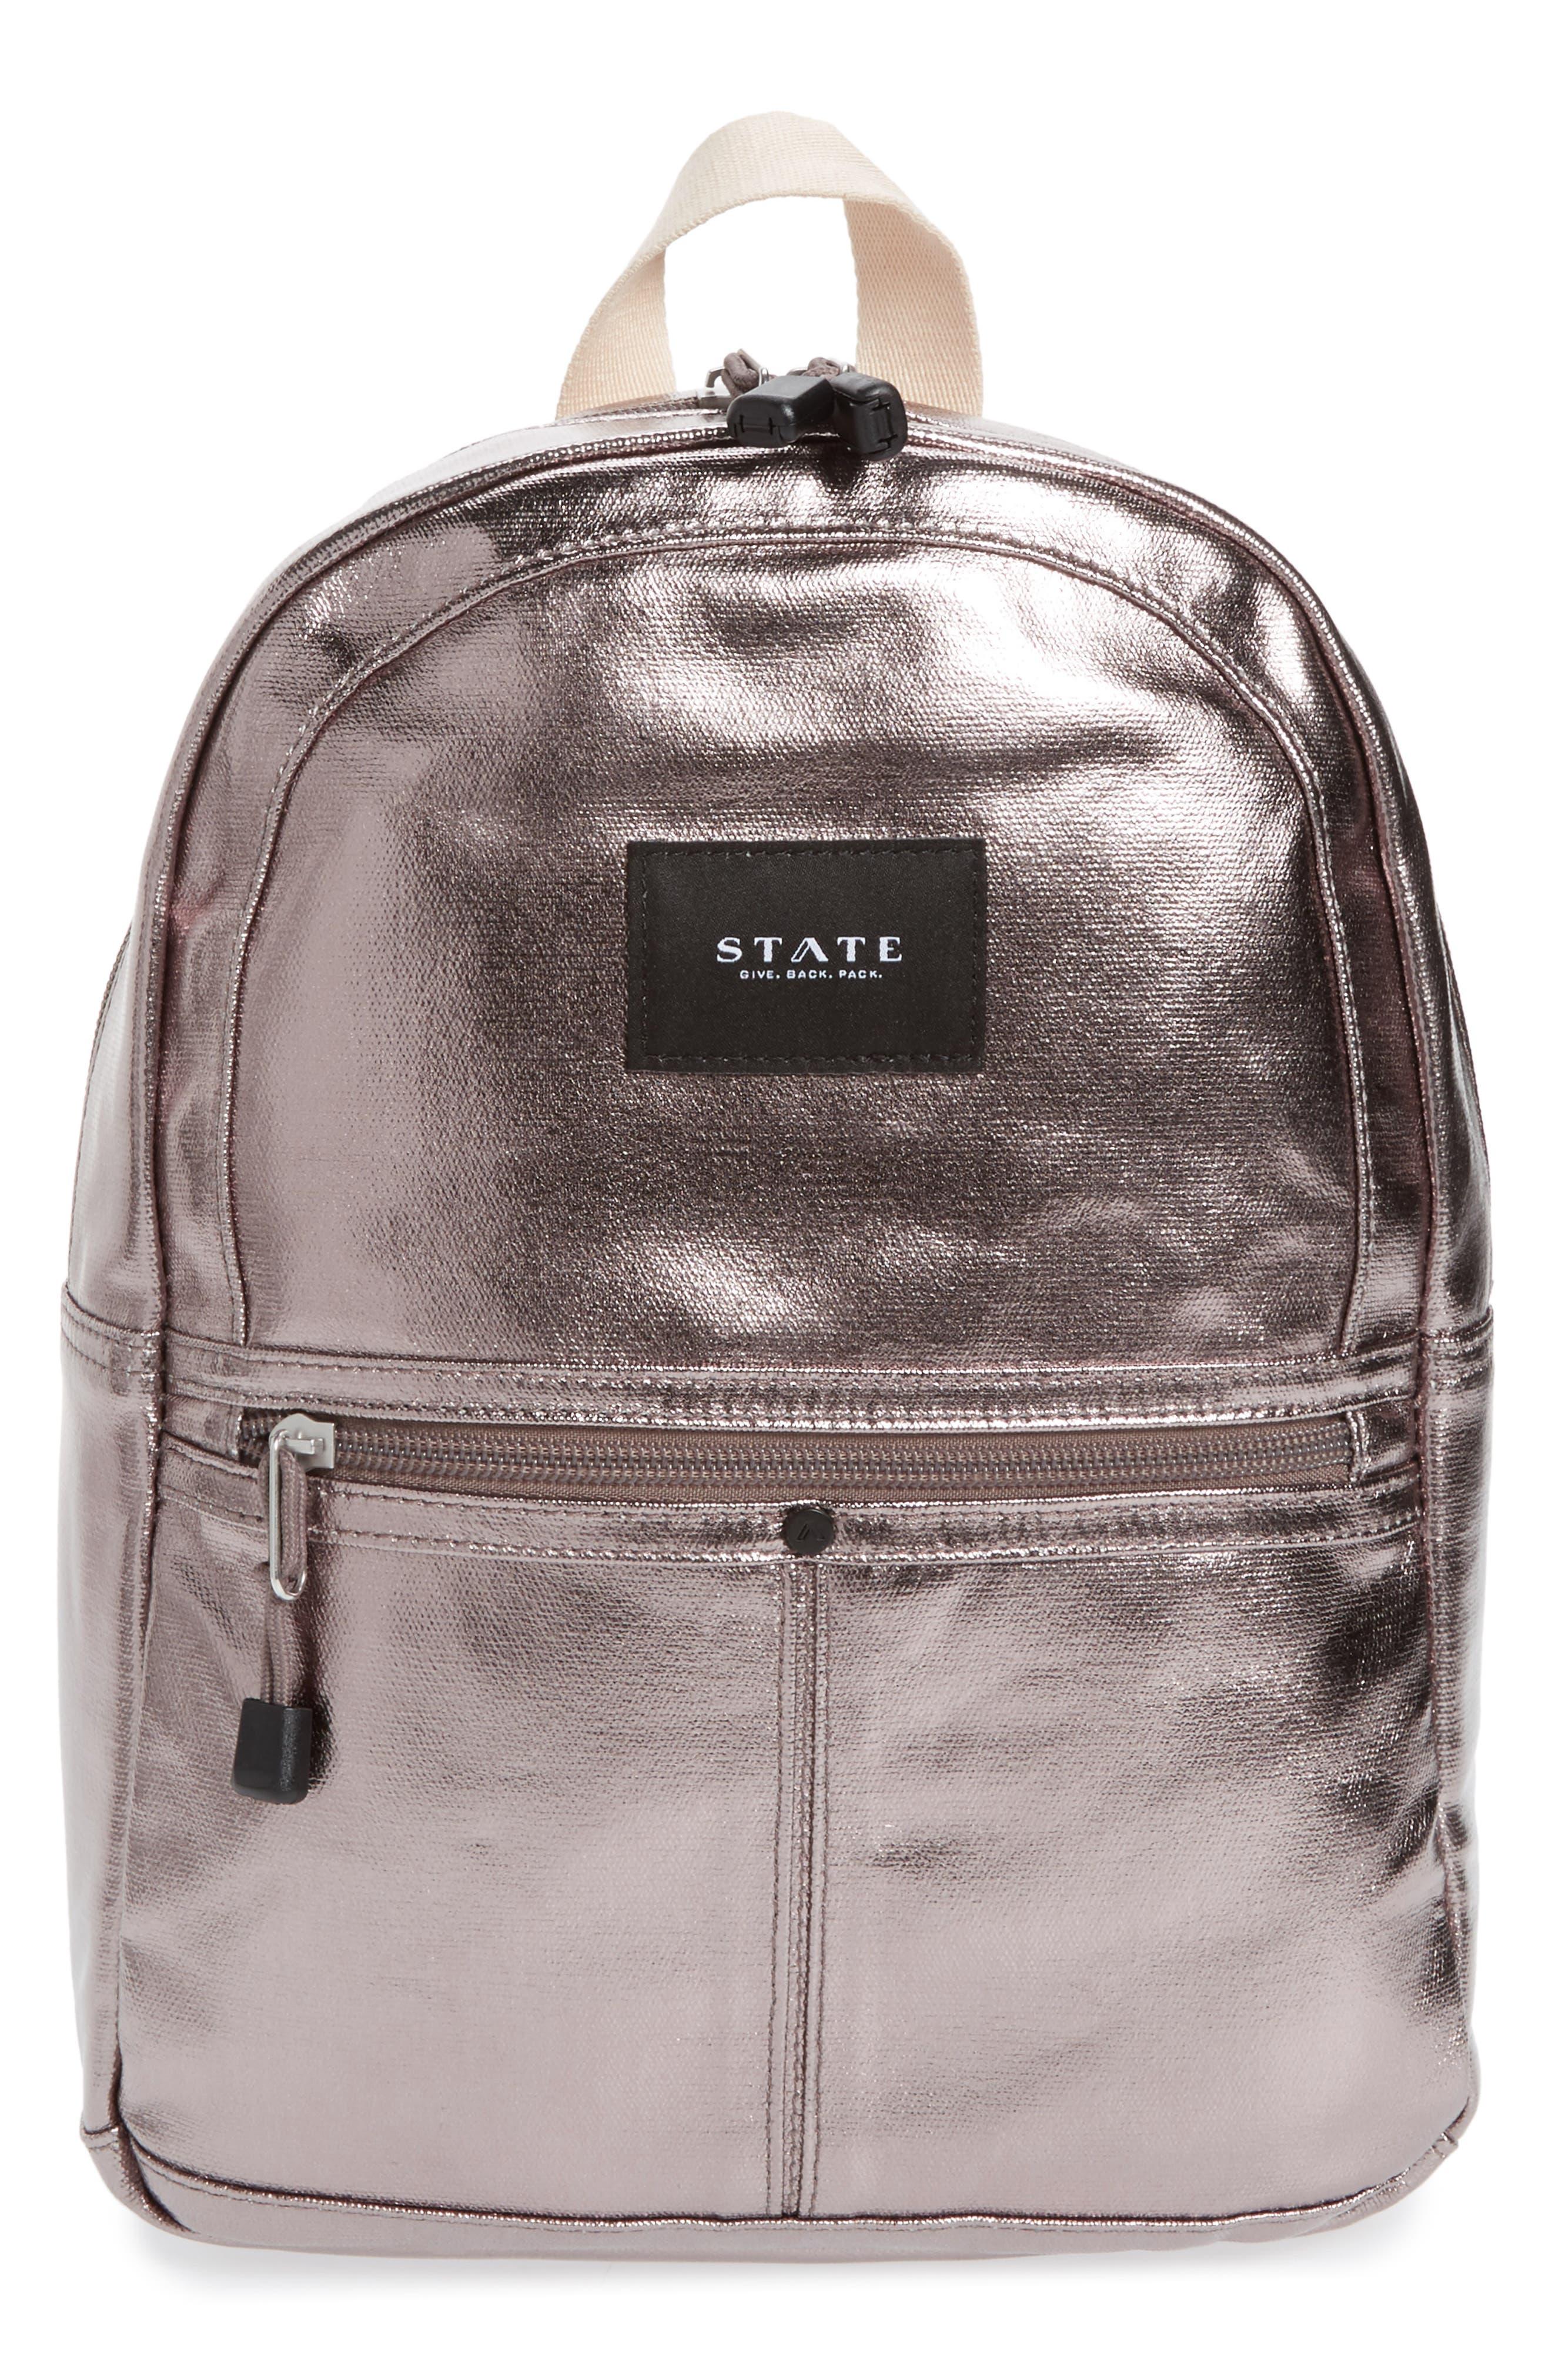 Mini Kane Backpack,                             Main thumbnail 1, color,                             040